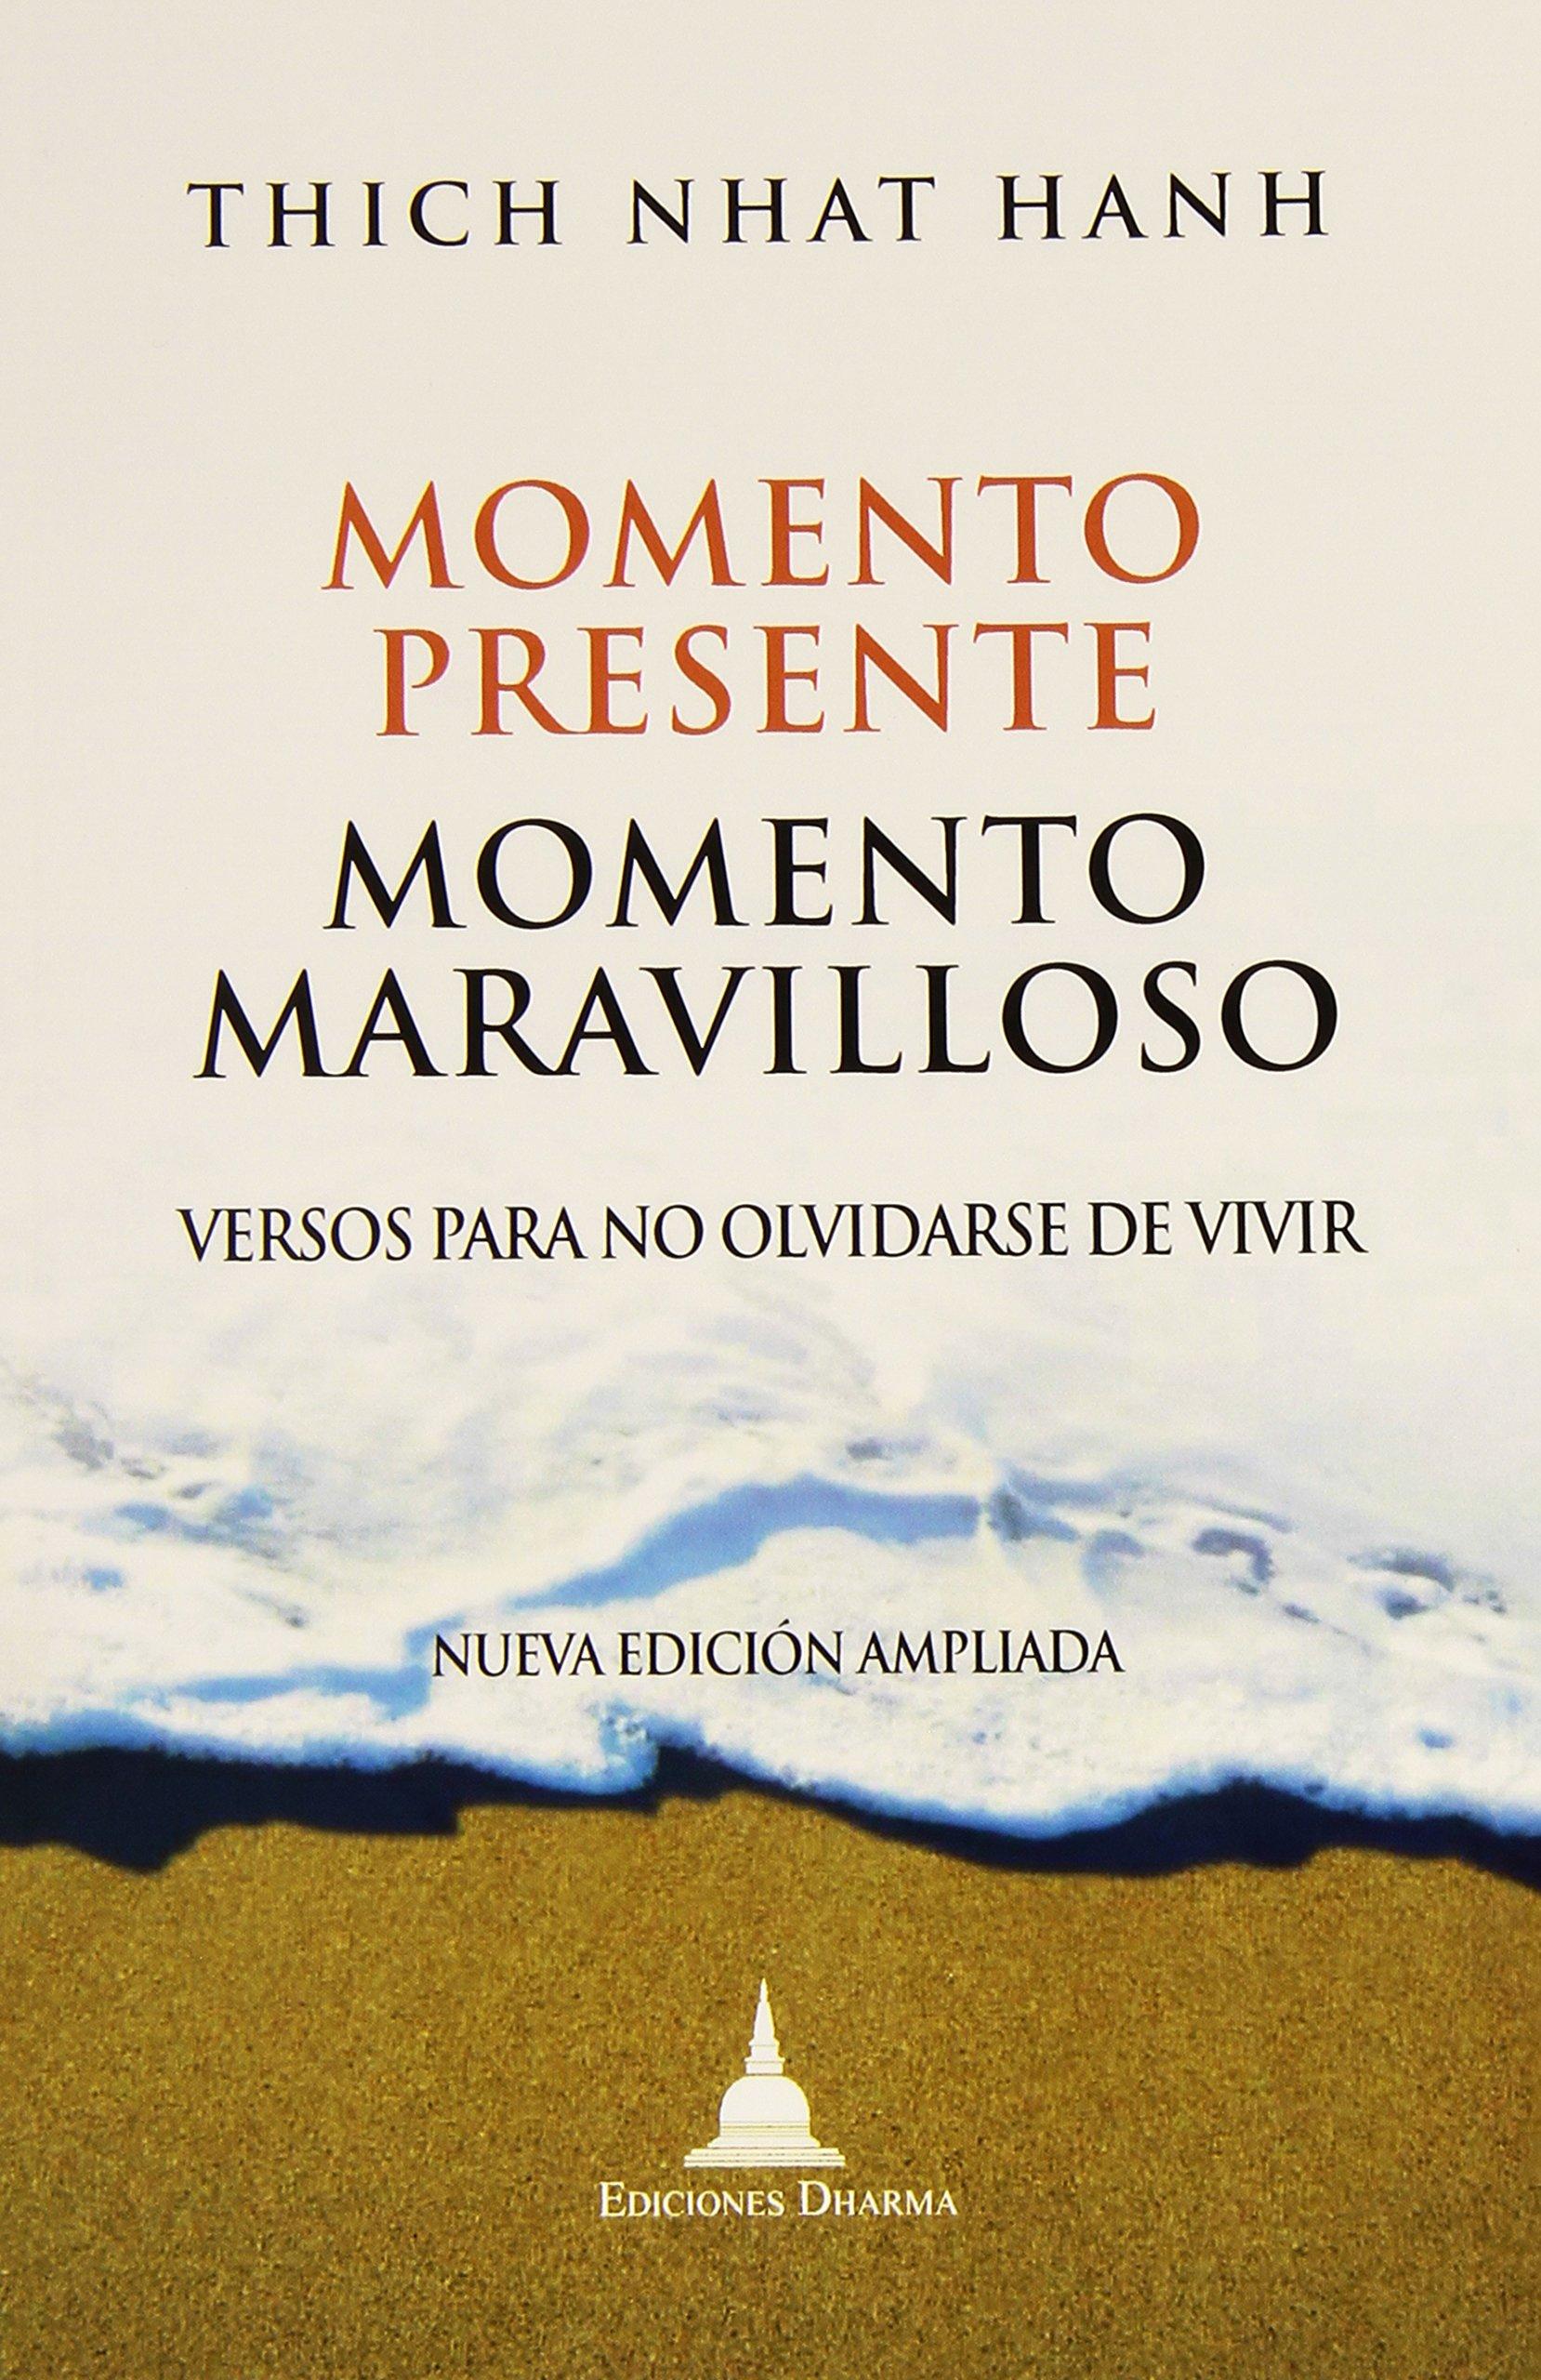 Momento Presente, Momento Maravilloso: Amazon.es: Thích Nhất Hạnh, Thich  Nhat Hanh: Libros